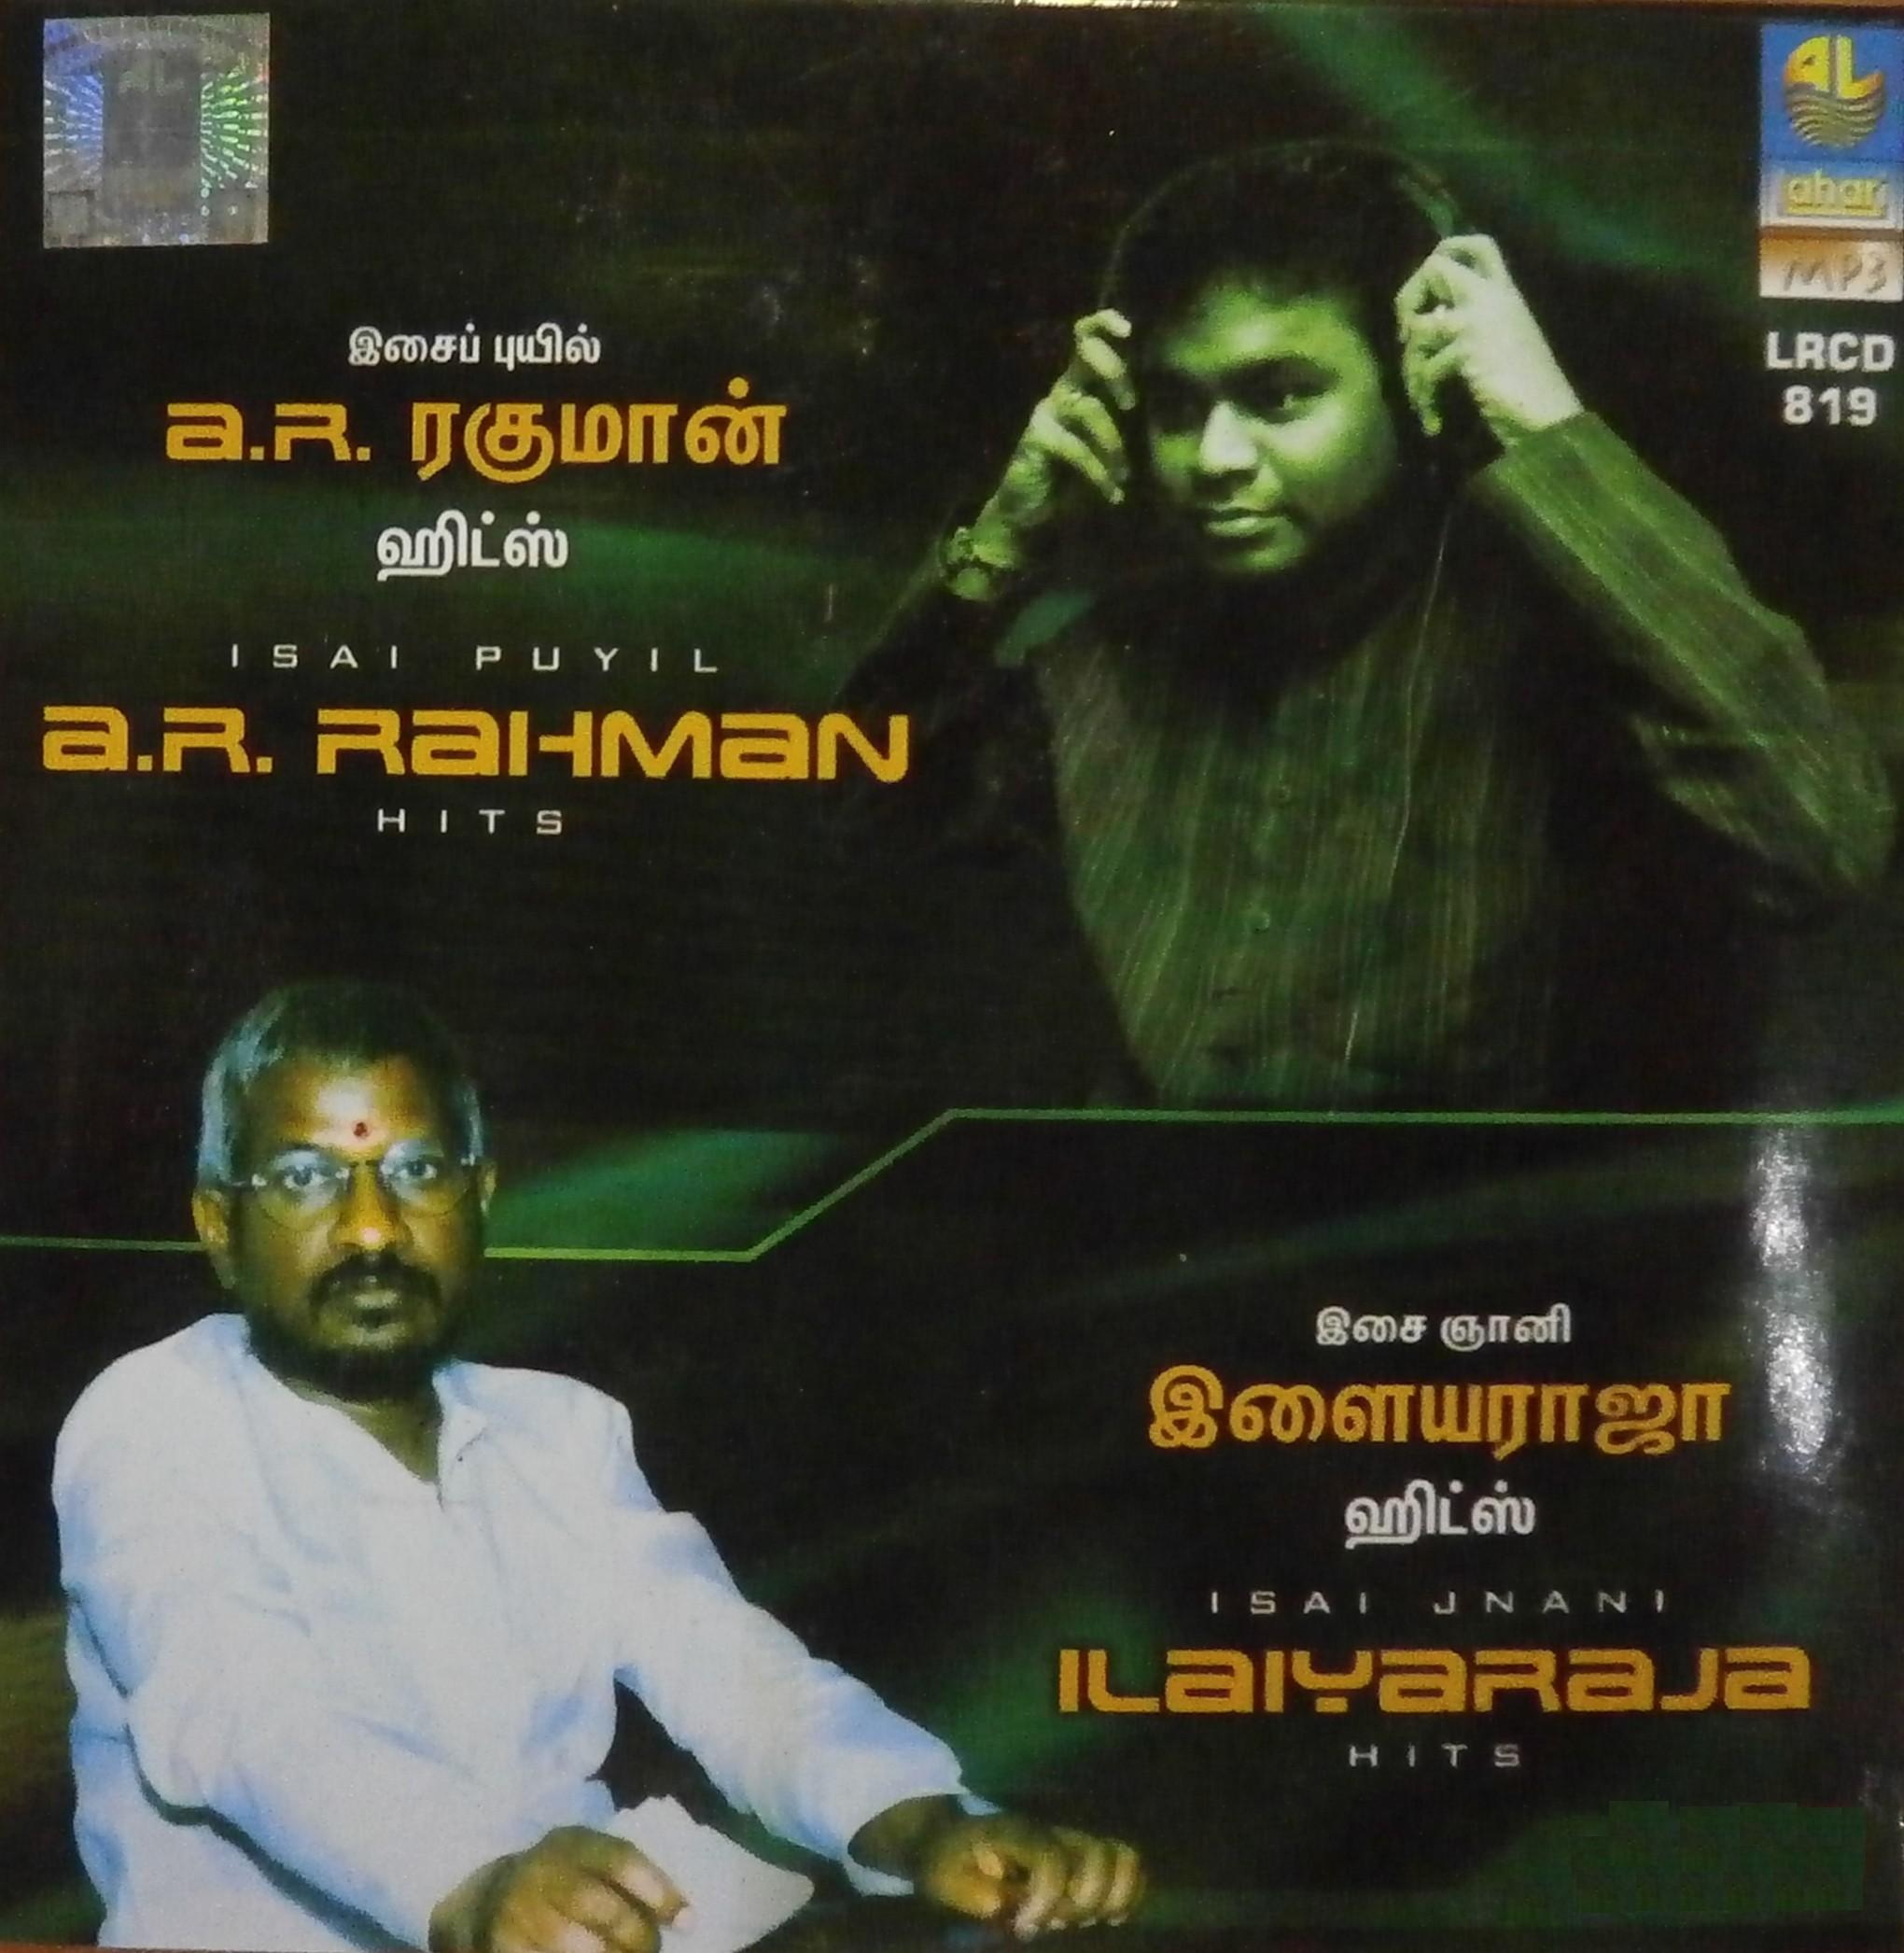 Tamil Movies by A. R. Rahman